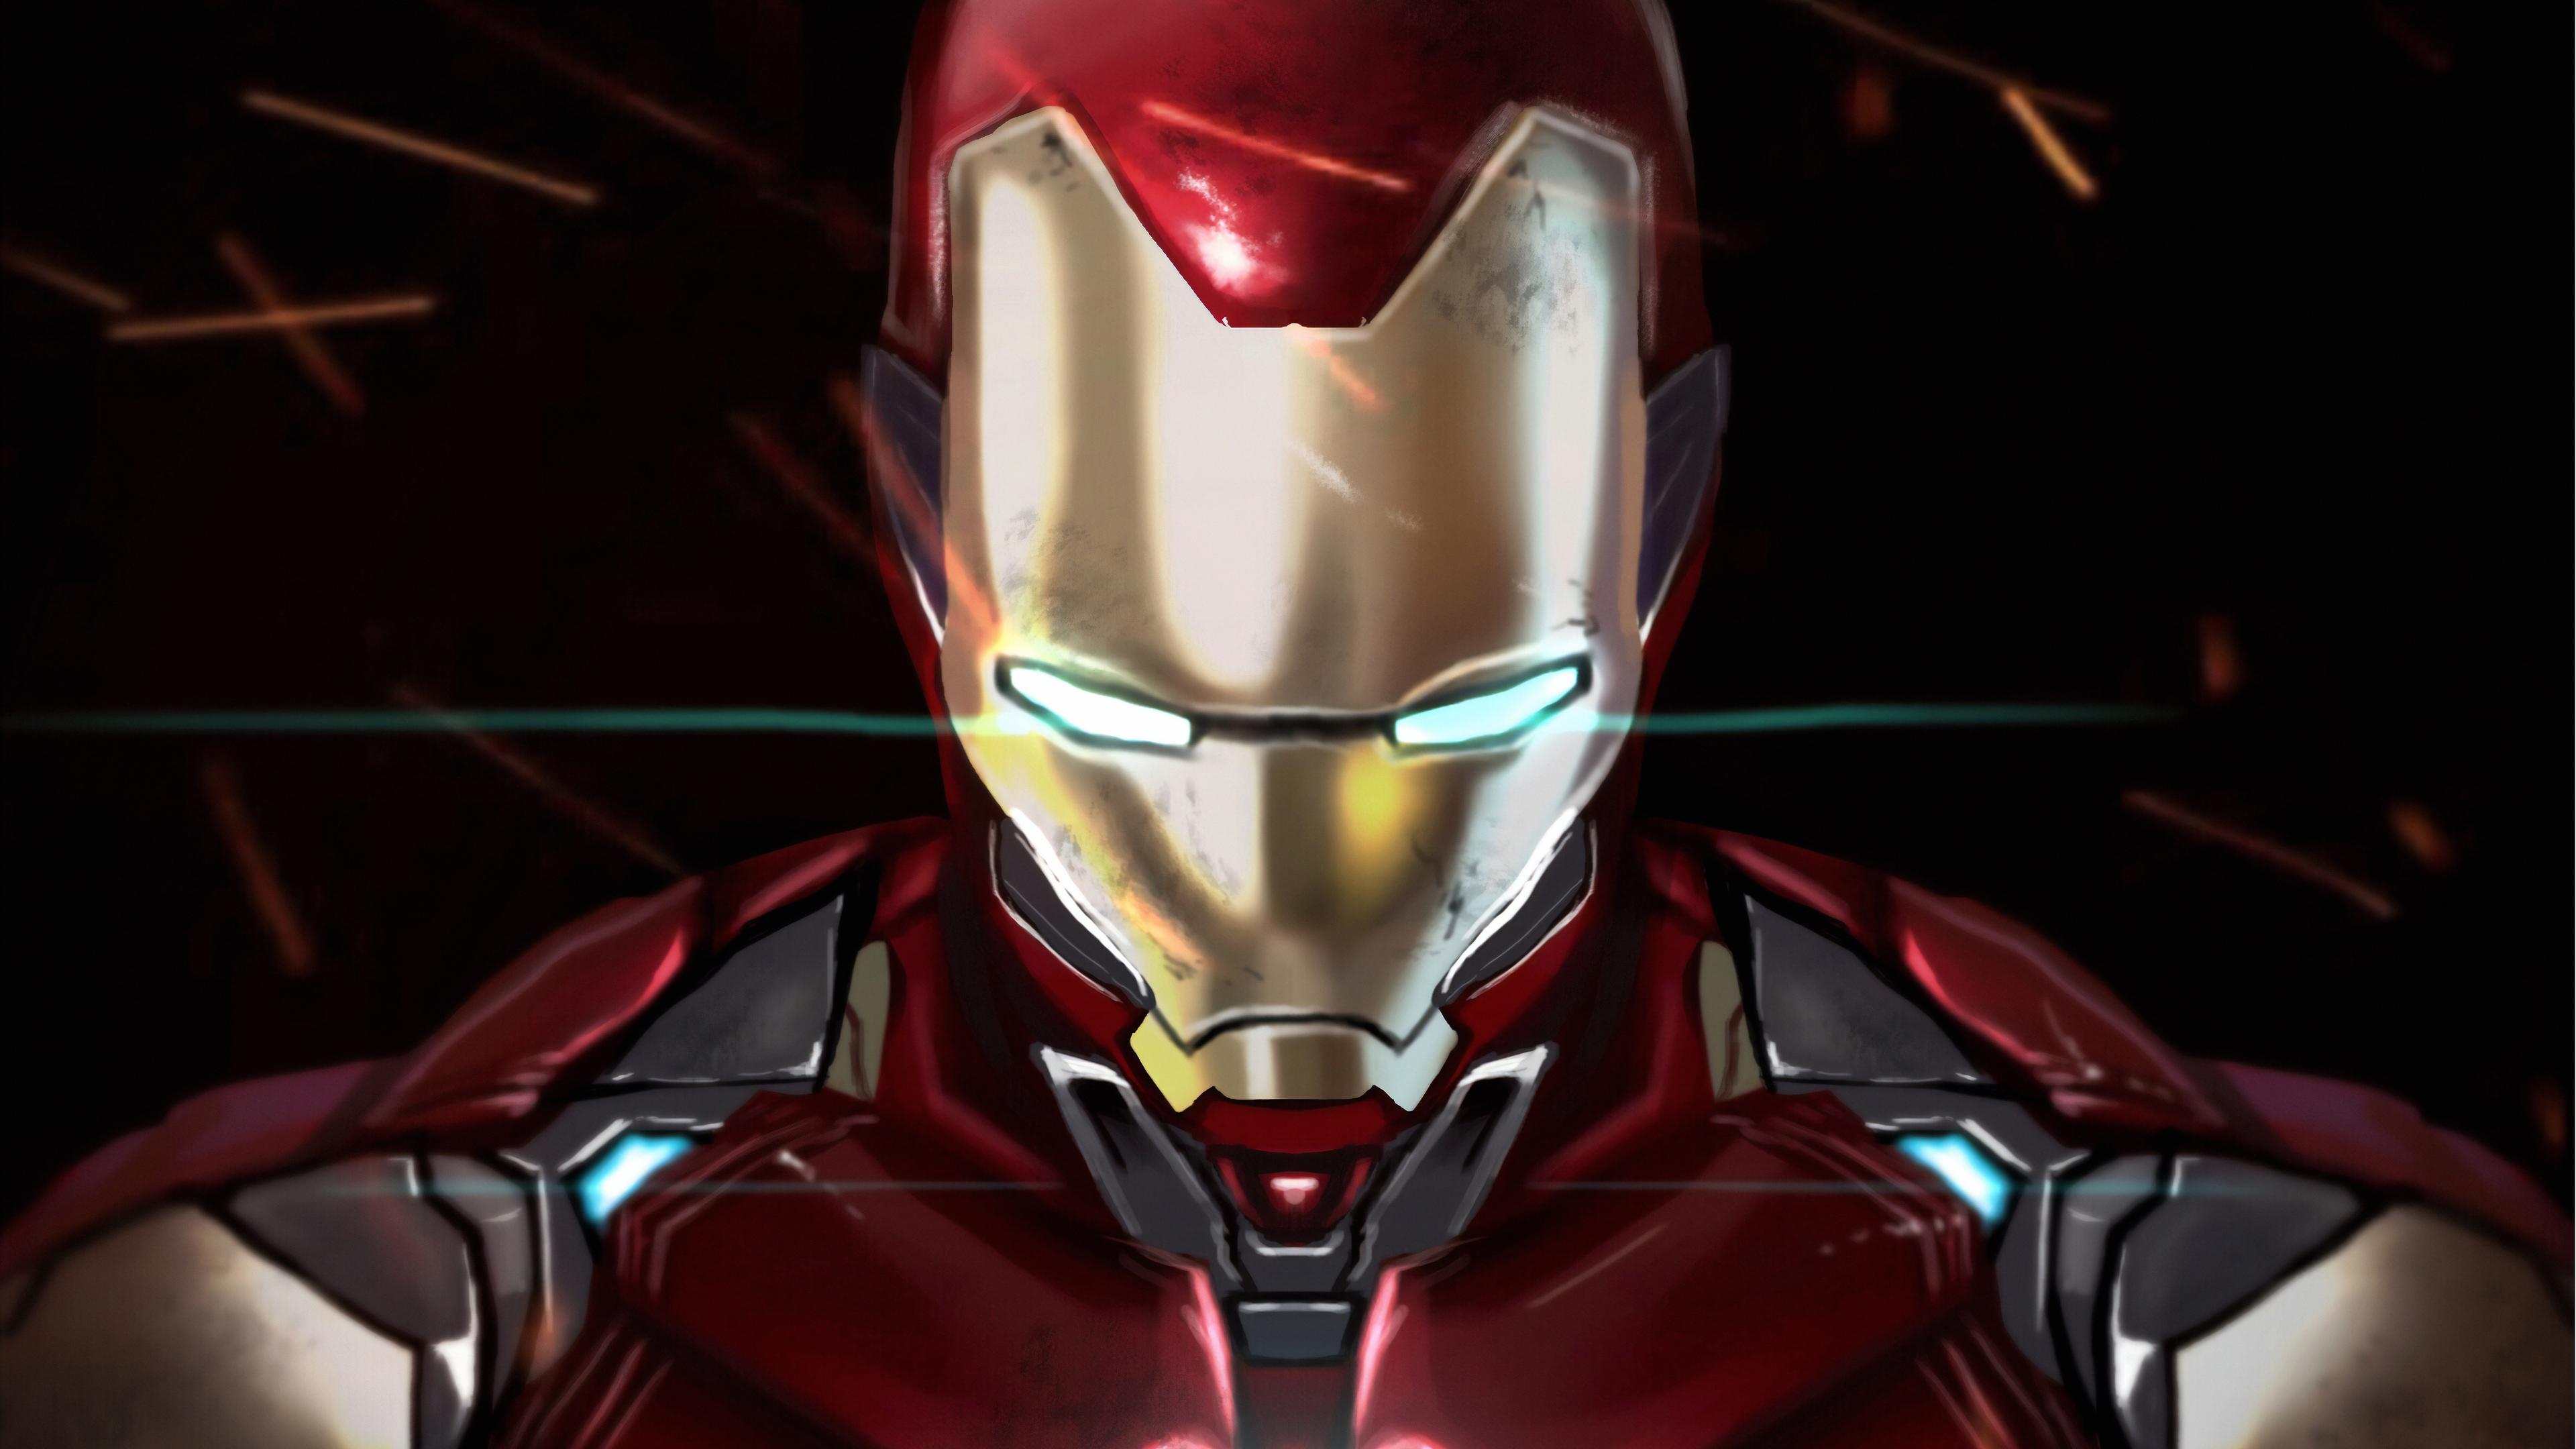 3840x2160 Iron Man With Infinity Gauntlet 4k Hd 4k